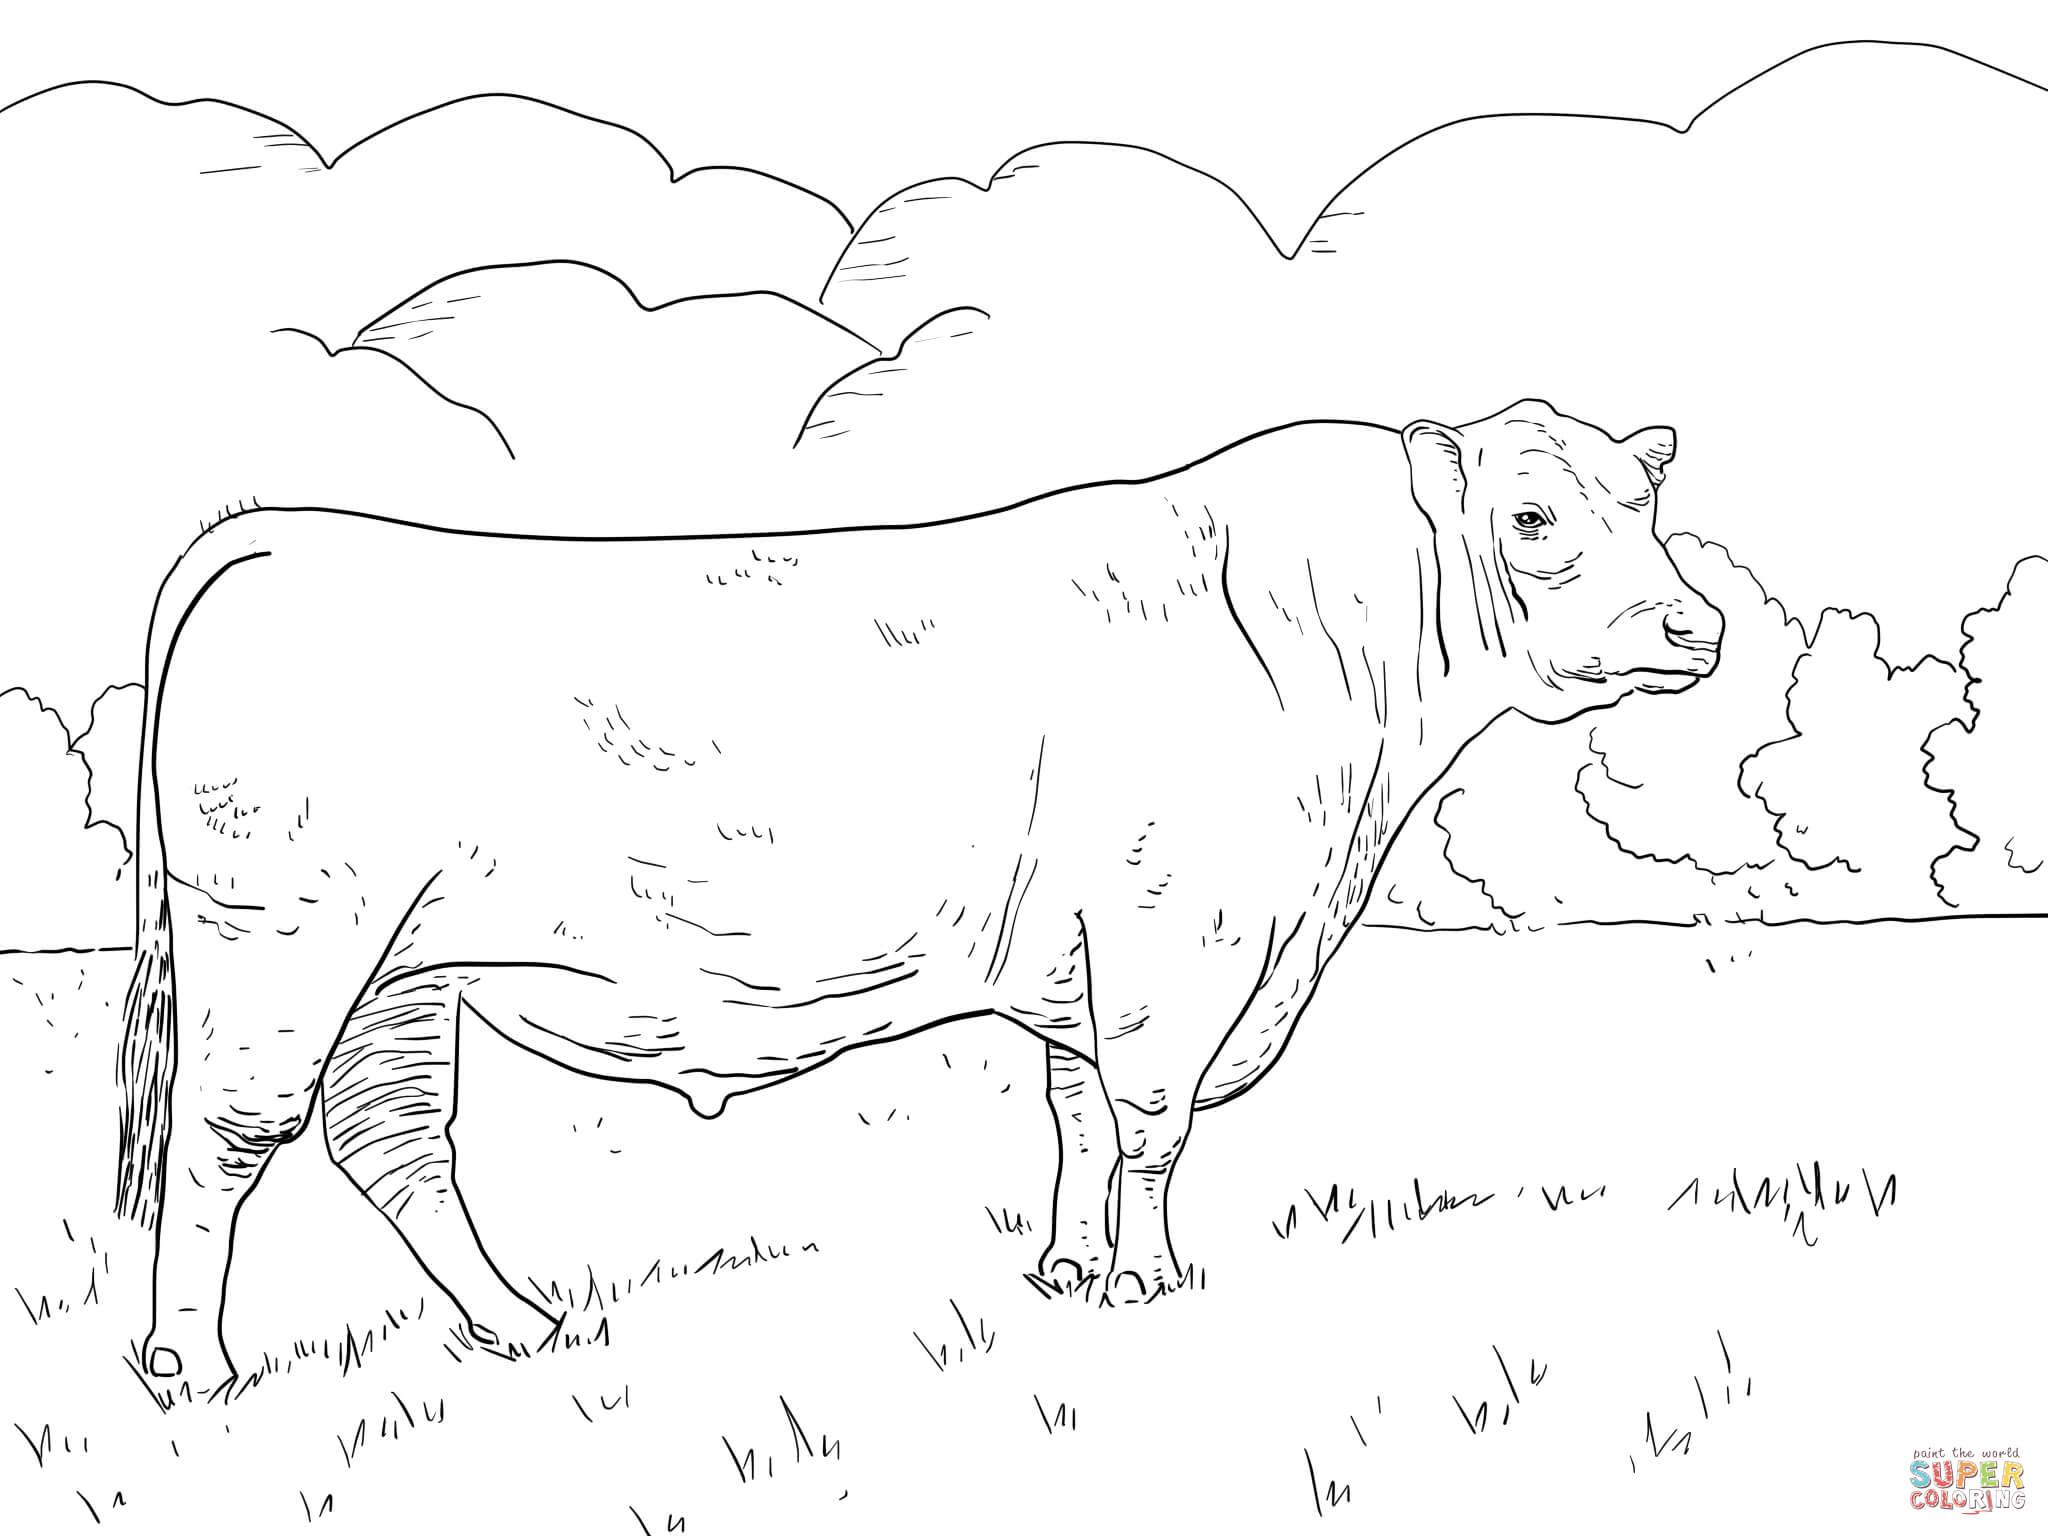 Angus Bull Coloring Page | Free Printable Coloring Pages - Coloring Pages Of Cows Free Printable